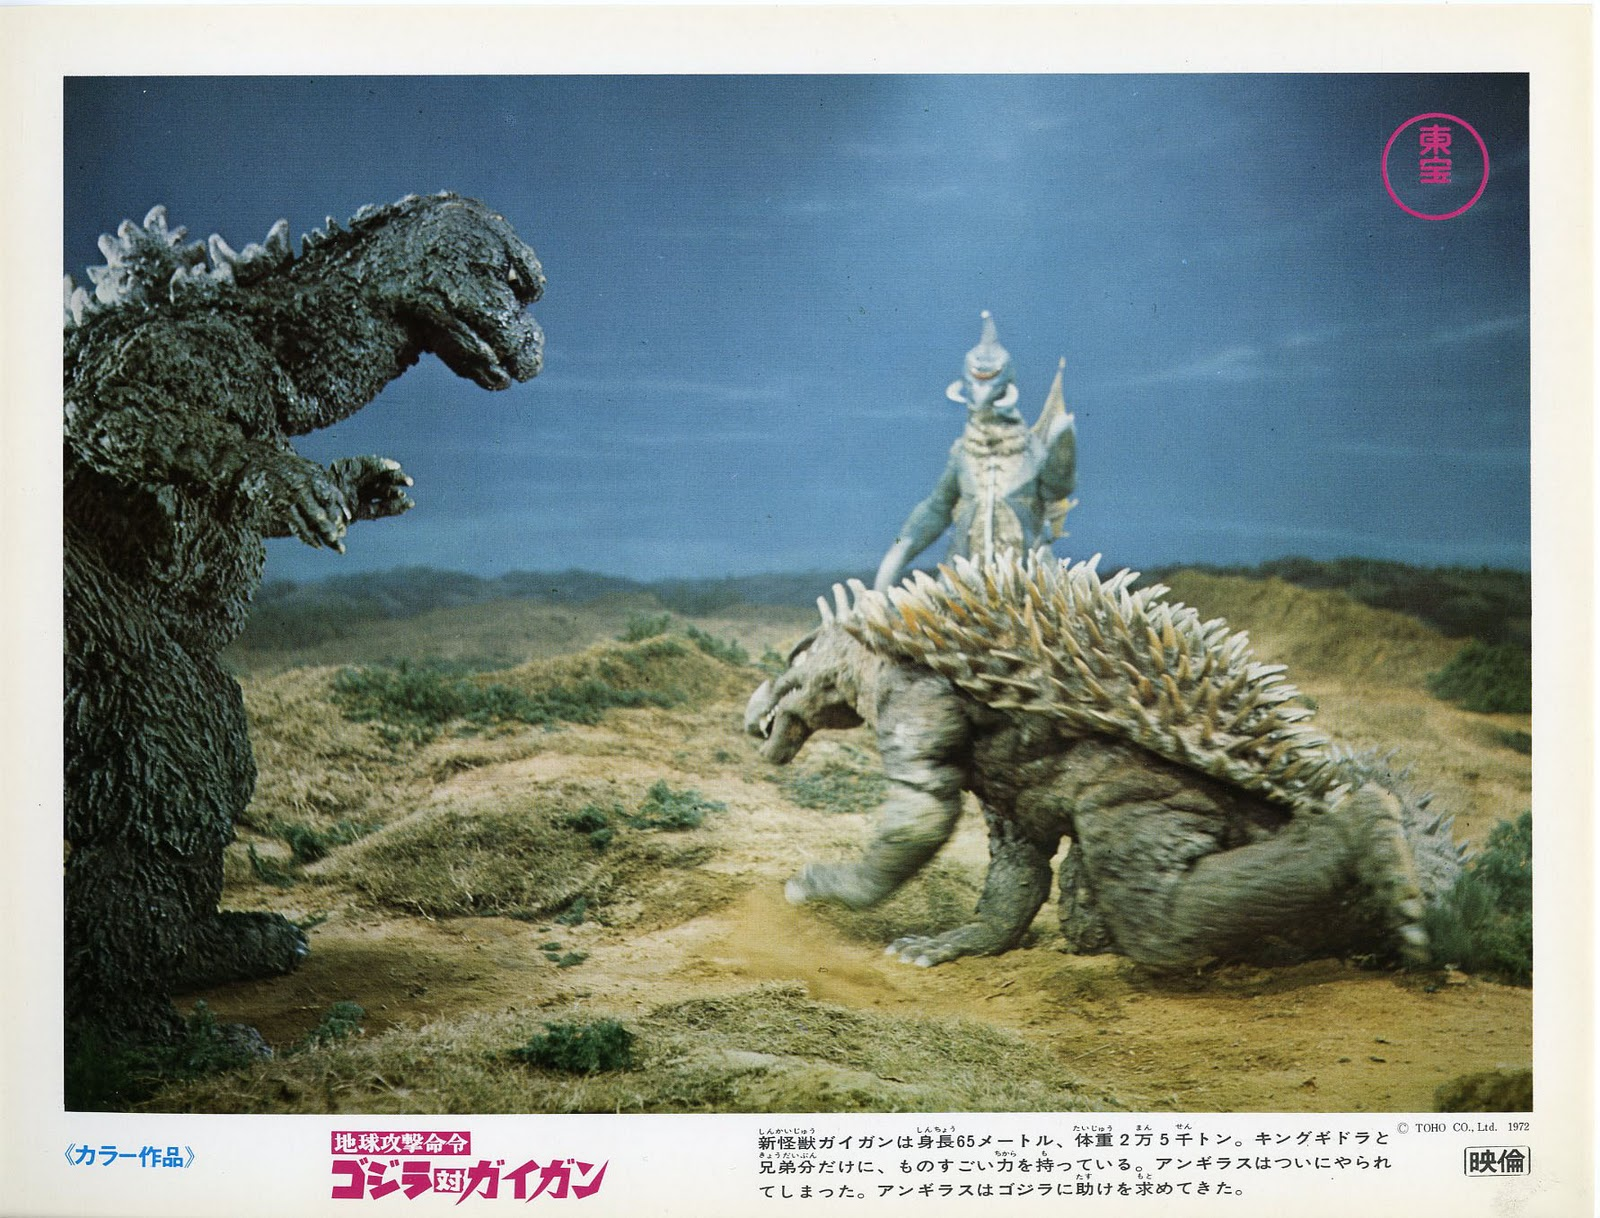 zontar of venus godzilla vs gigan 1976 japanese lobby